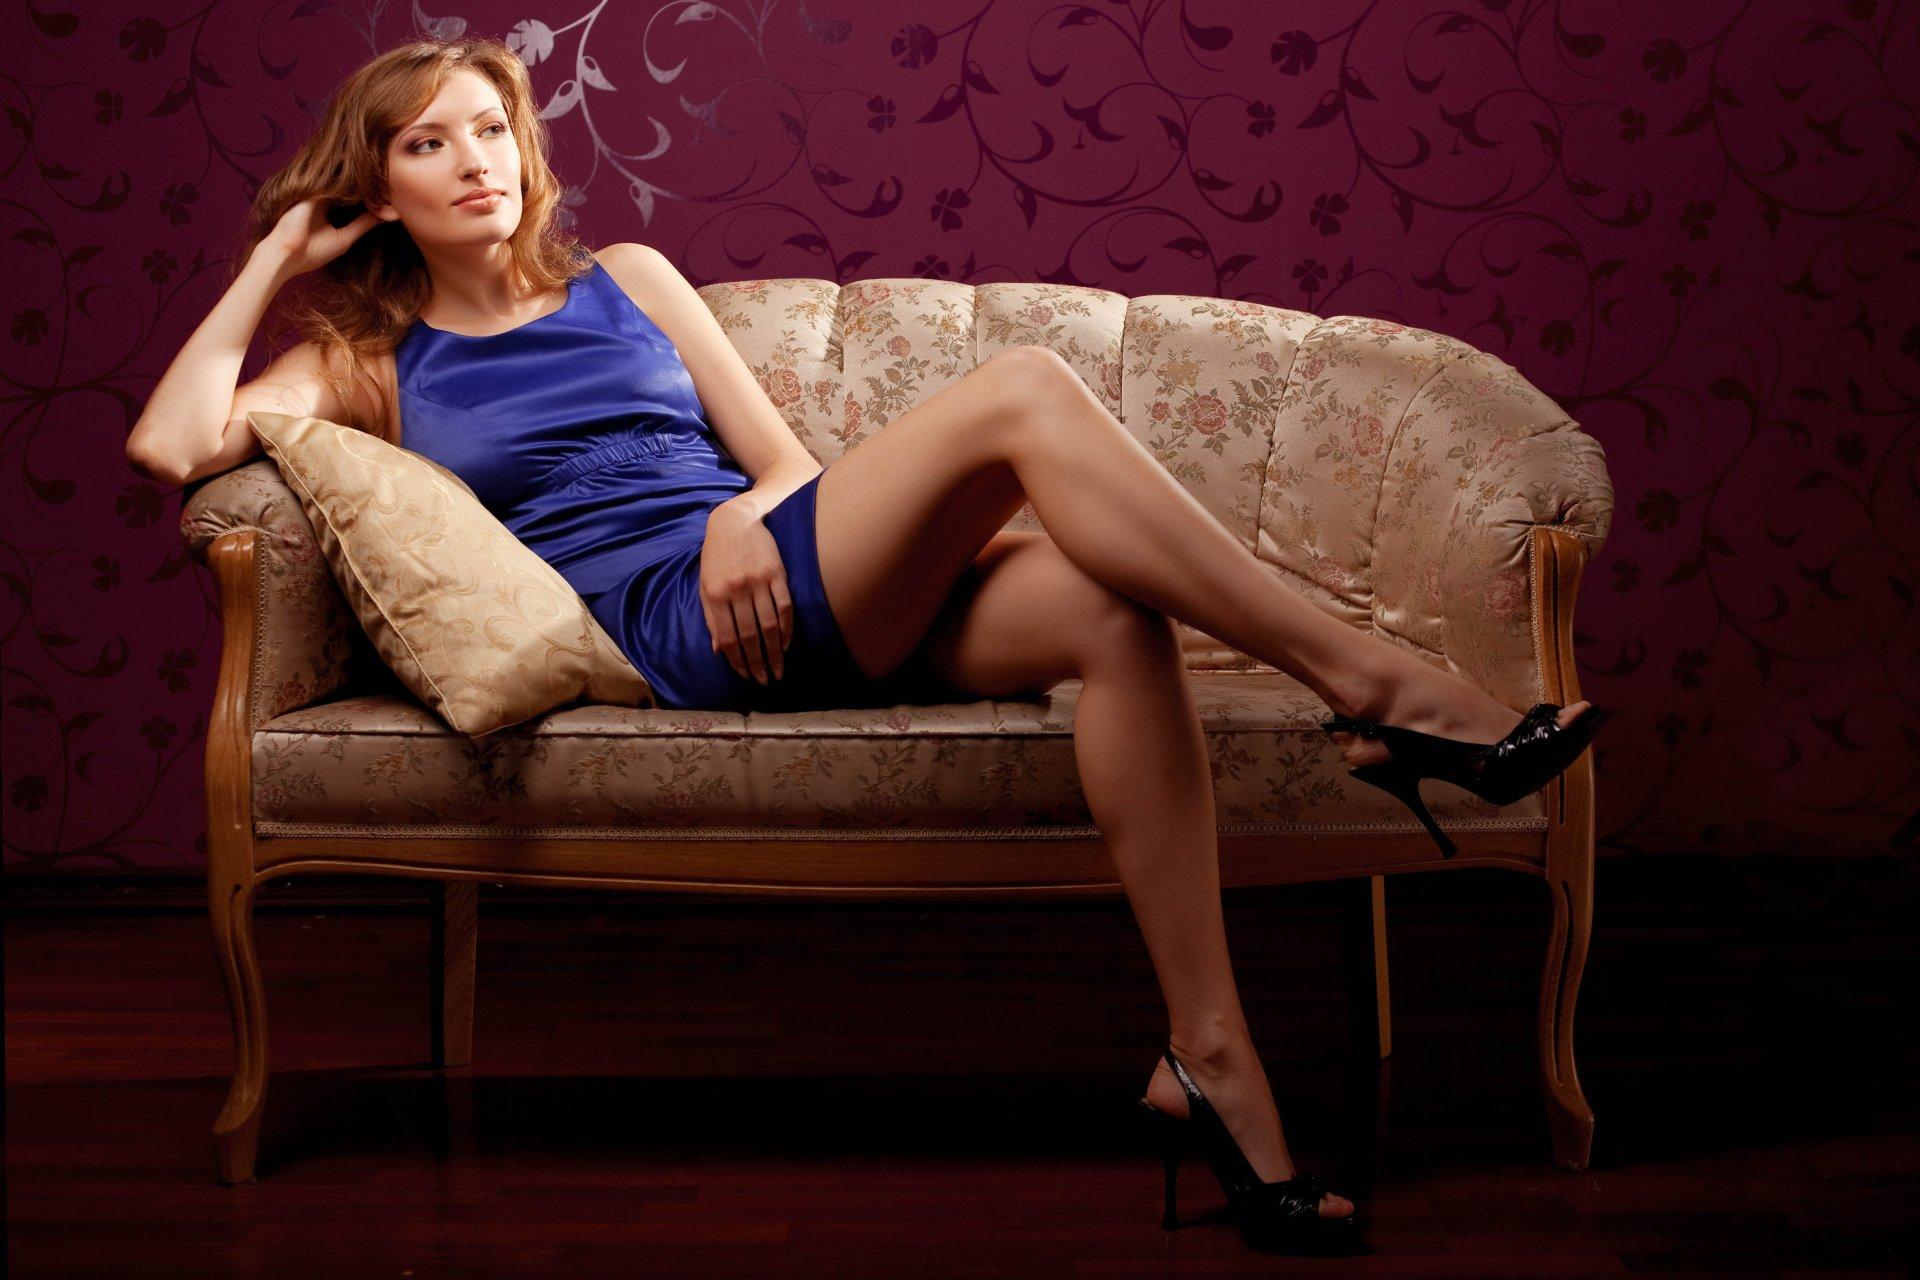 Красавица на диване — pic 7